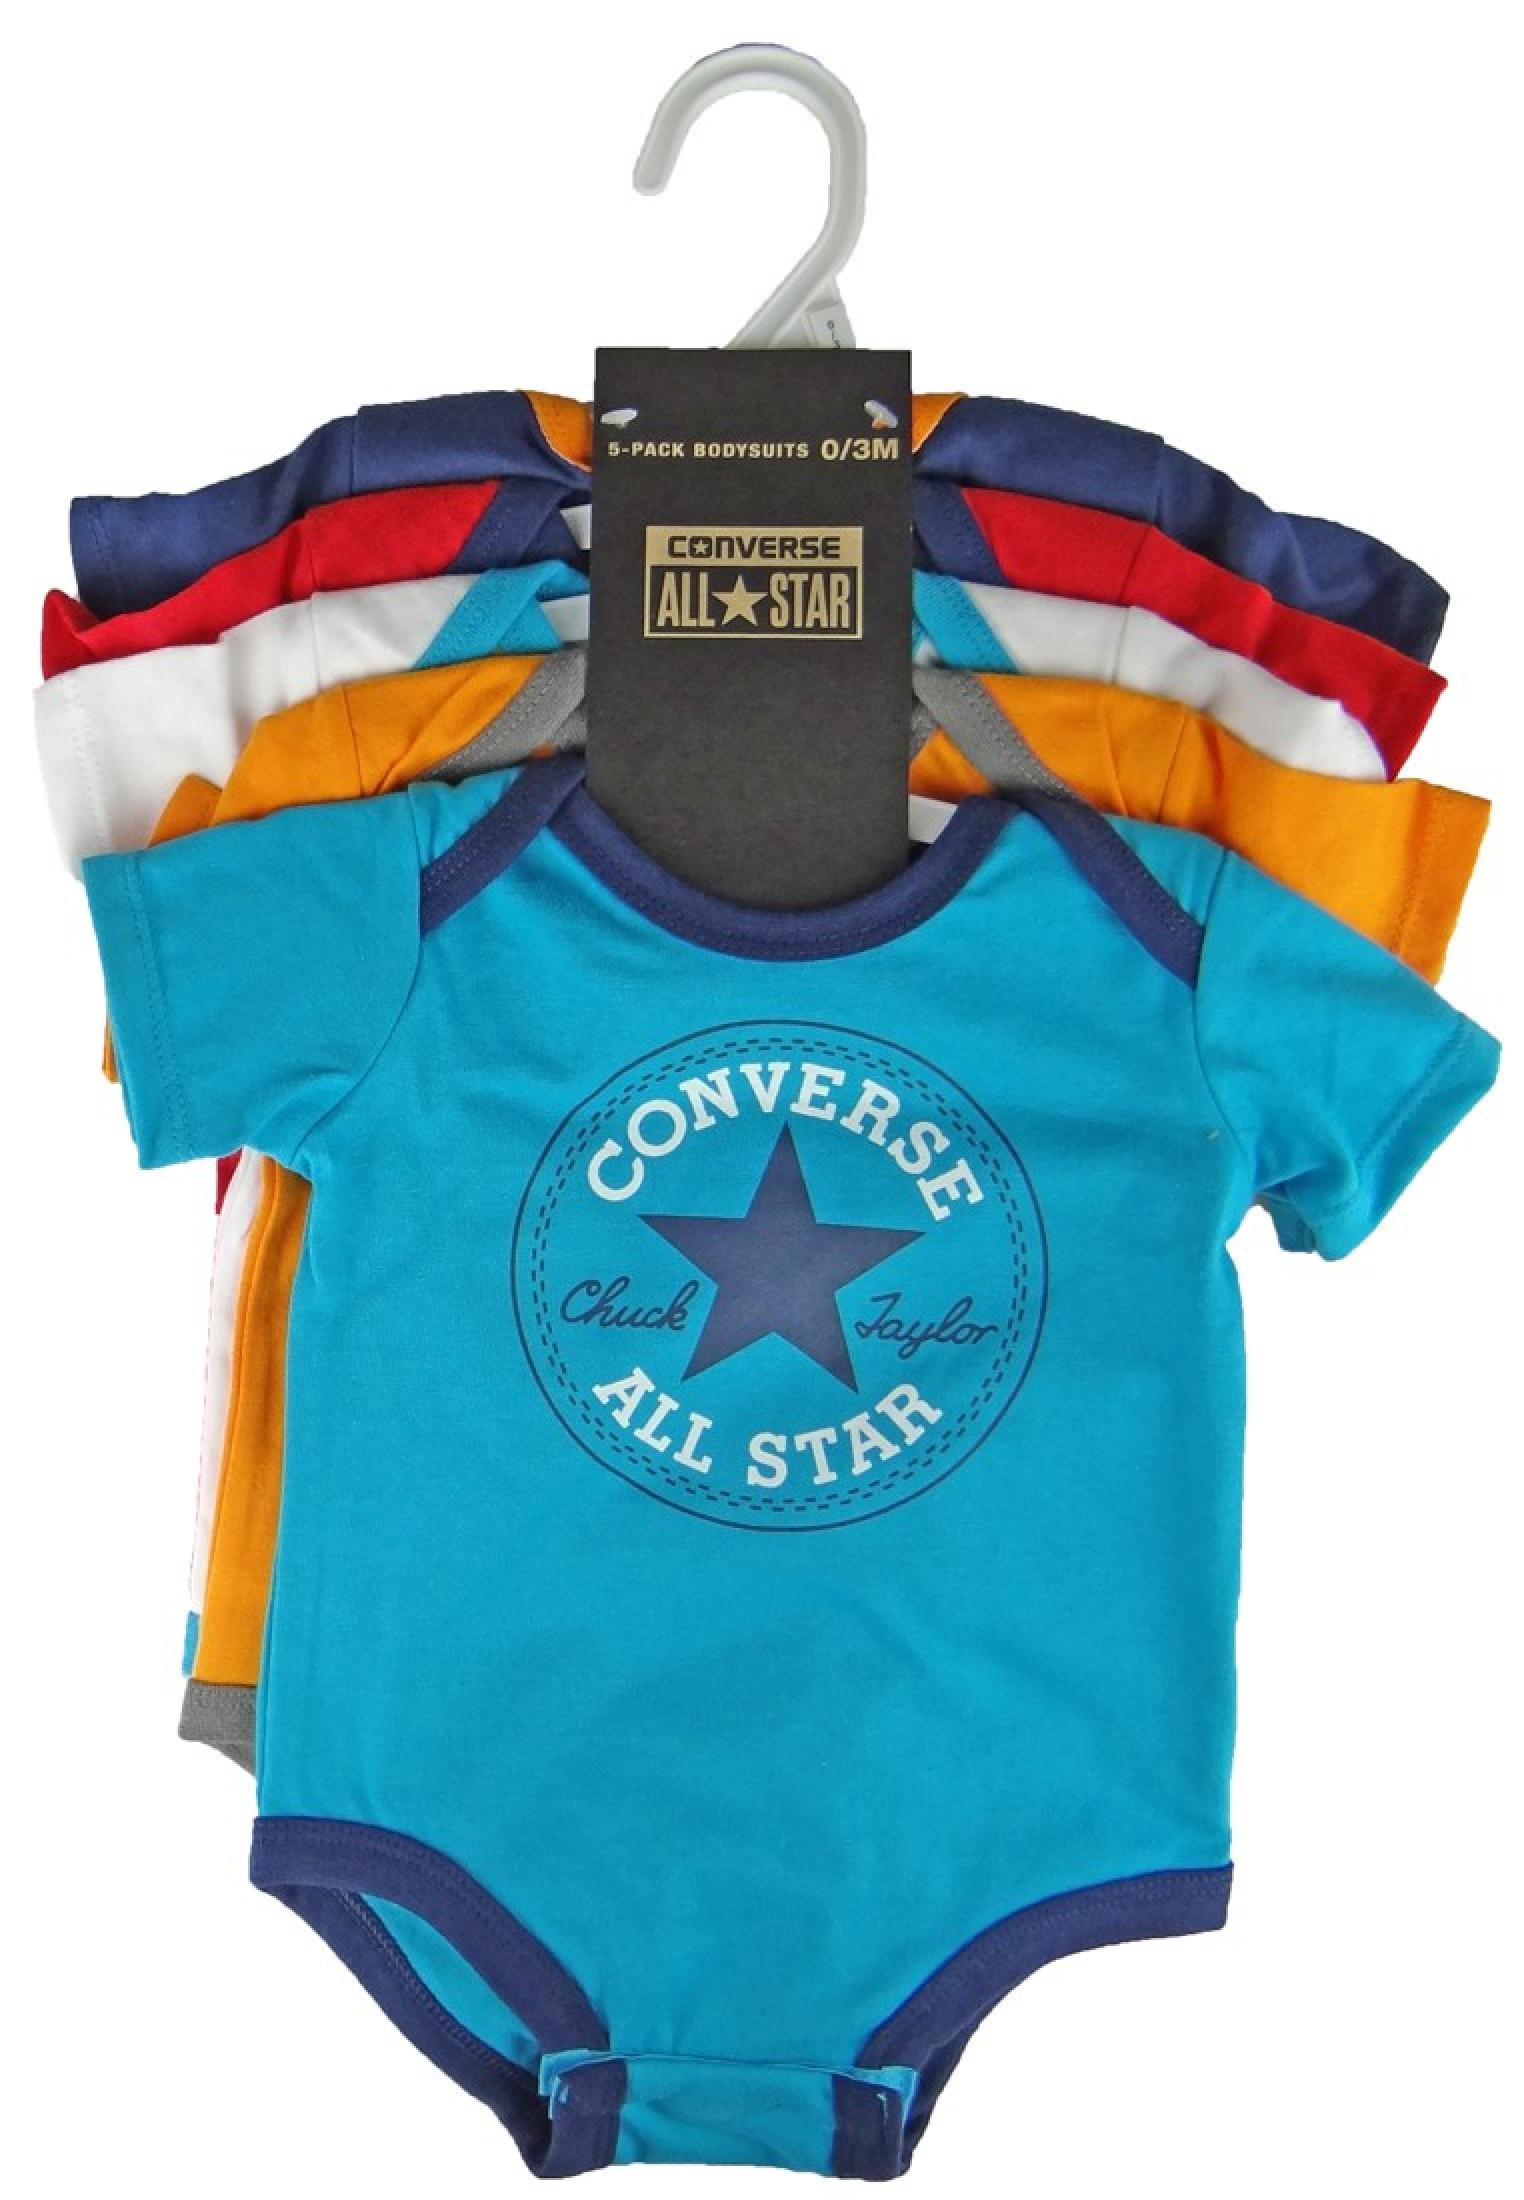 Converse Baby Romper 562273 Boys Baby Bodys Set Of 5 On Hanger